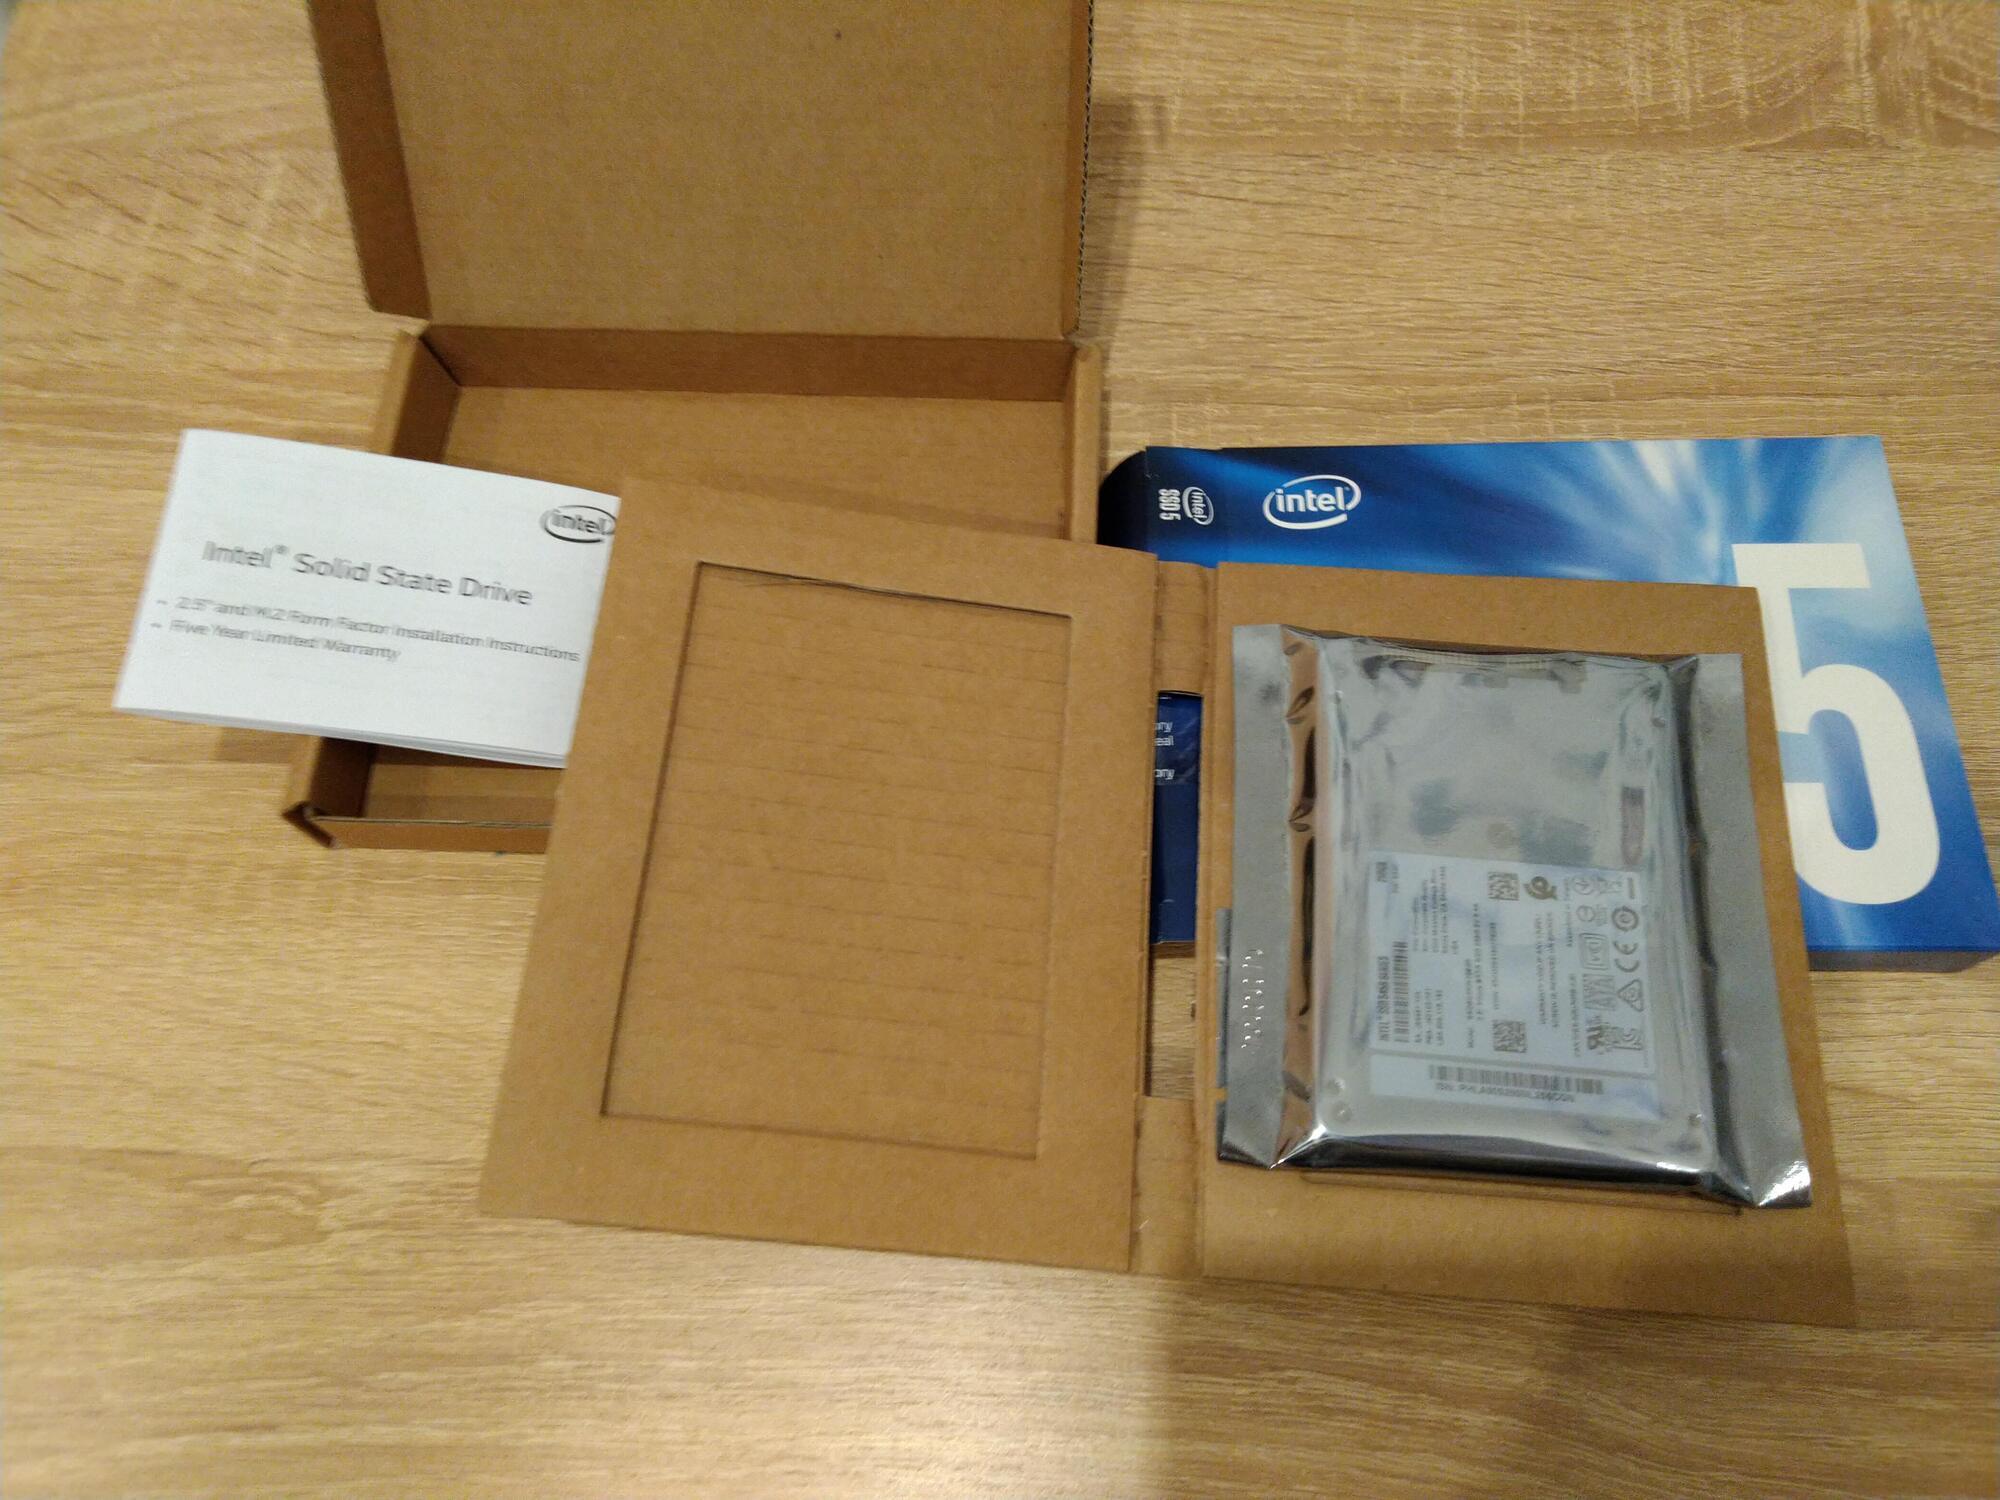 Kompyutery i komplektuyushcie - Obzor SSD INTEL 545s 256Gb SATA-III (SSDSC2KW256G8X1)